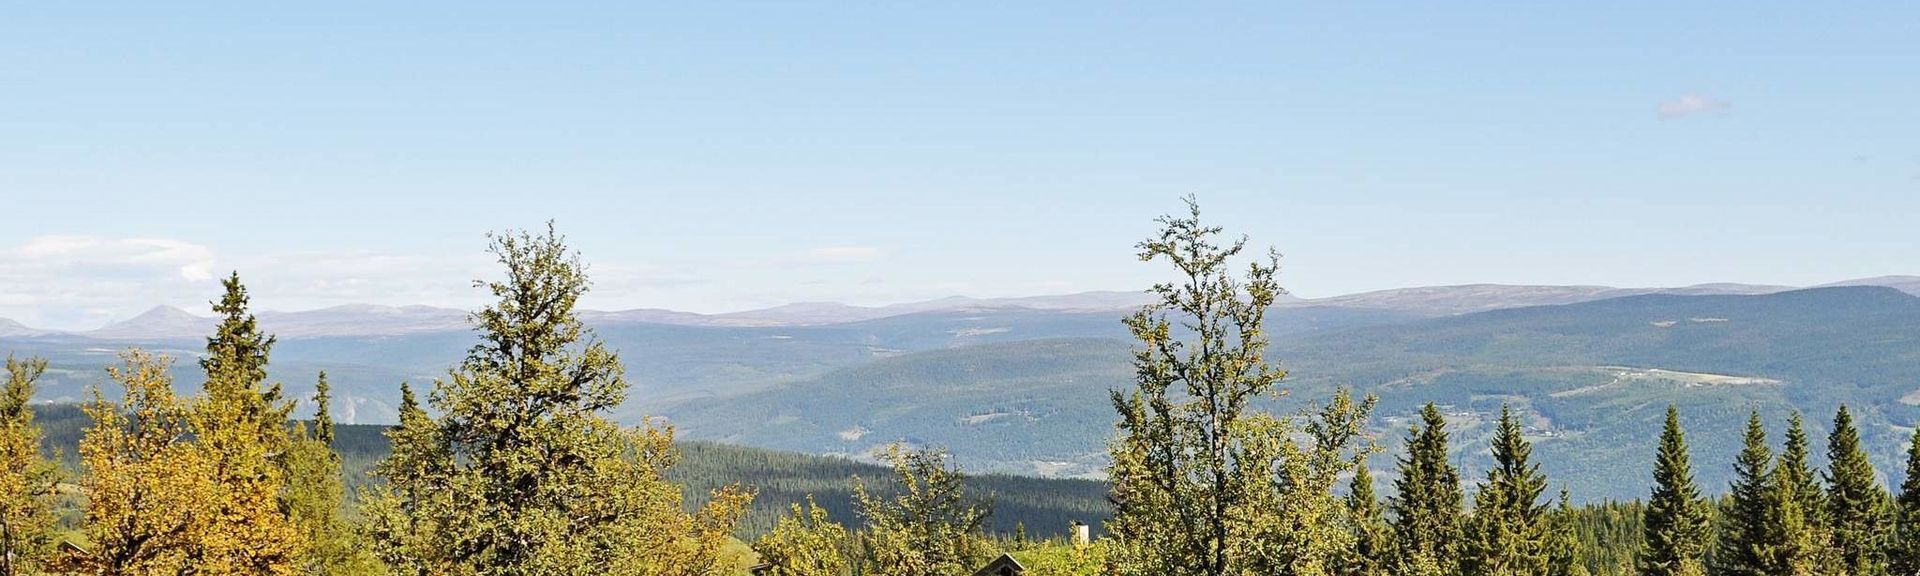 Skeikampen, Svingvoll, Oppland, Norge